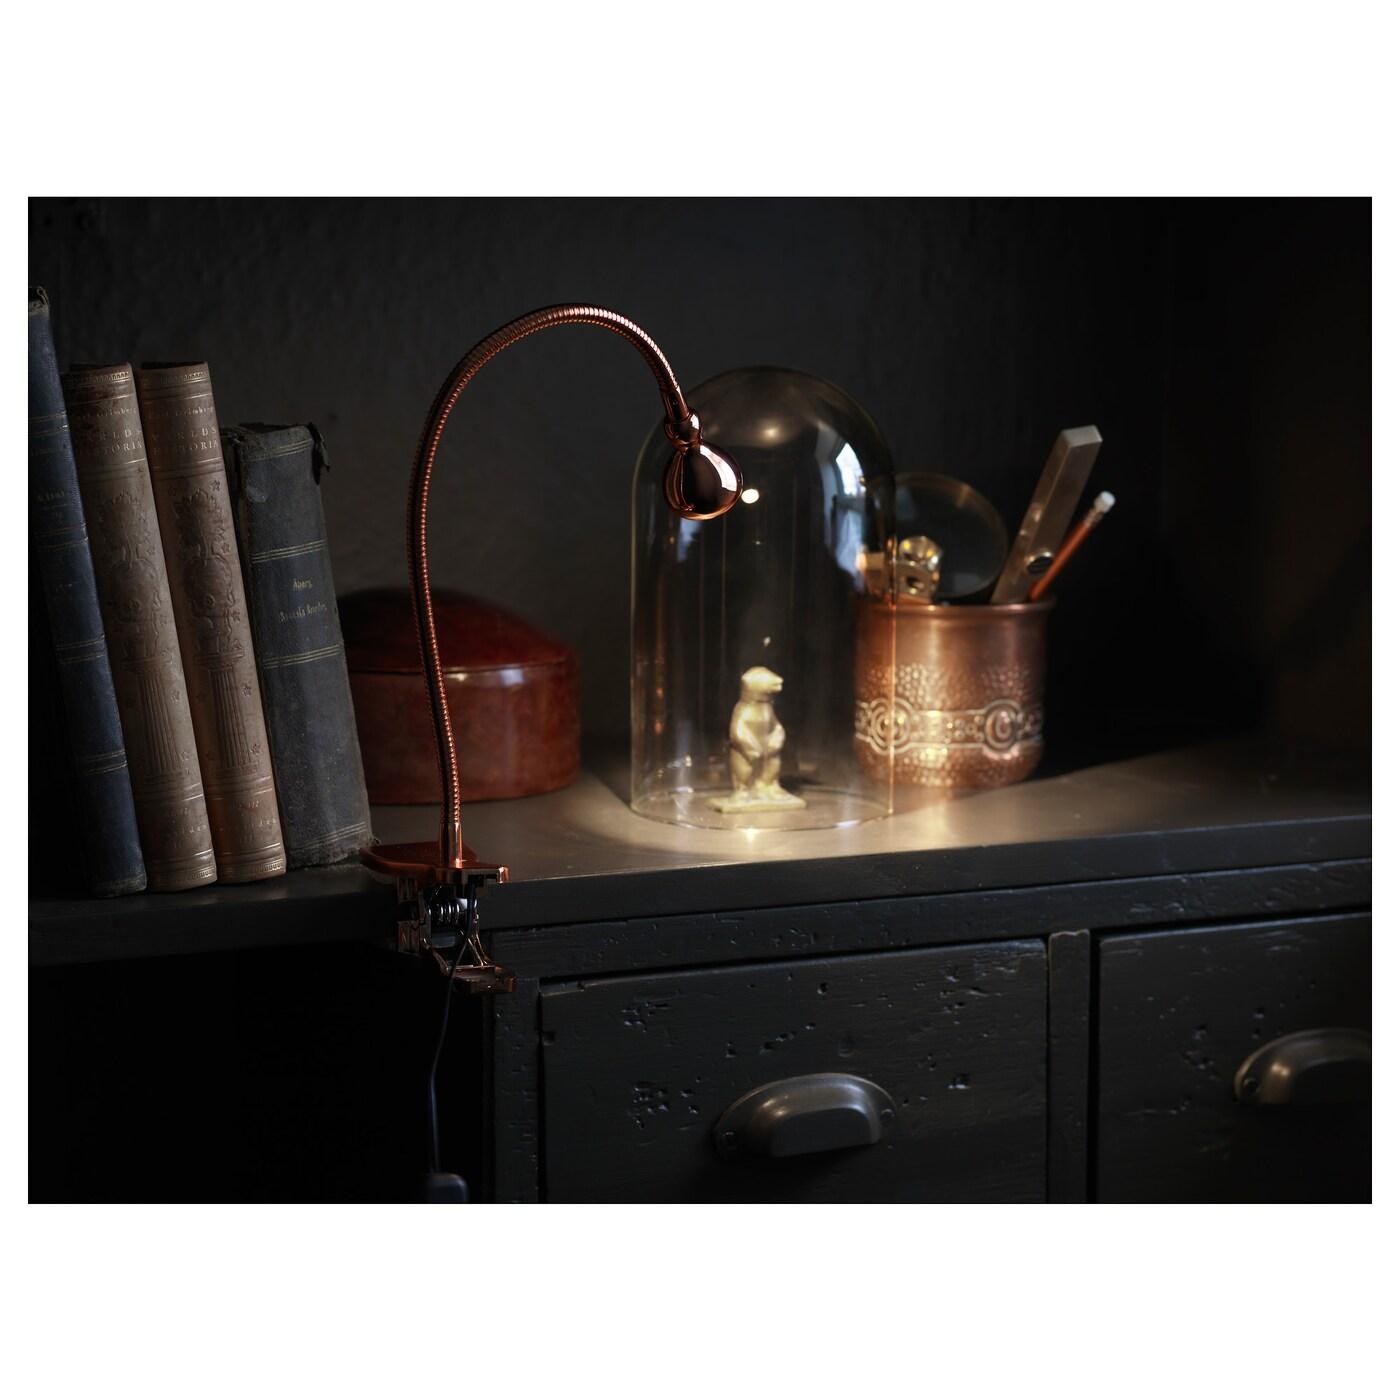 Jansj Led Wall Clamp Spotlight Copper Colour Ikea # Couleur Ikea